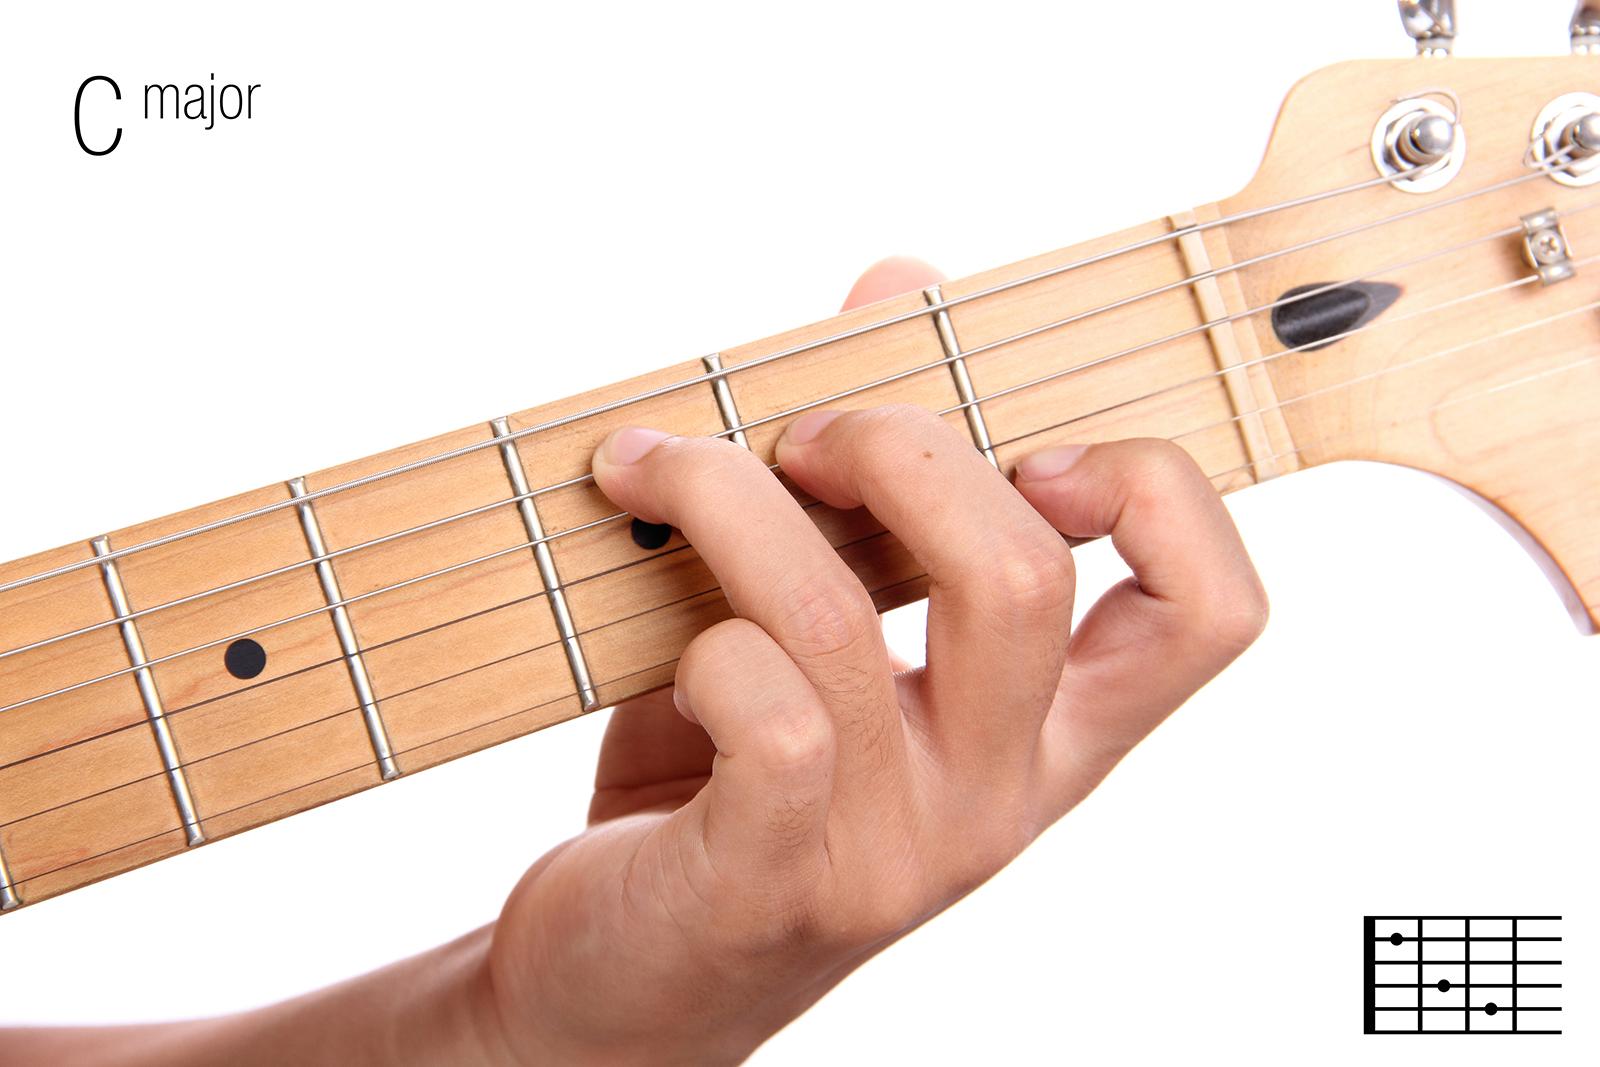 C Major - Guitar Chords For Beginners